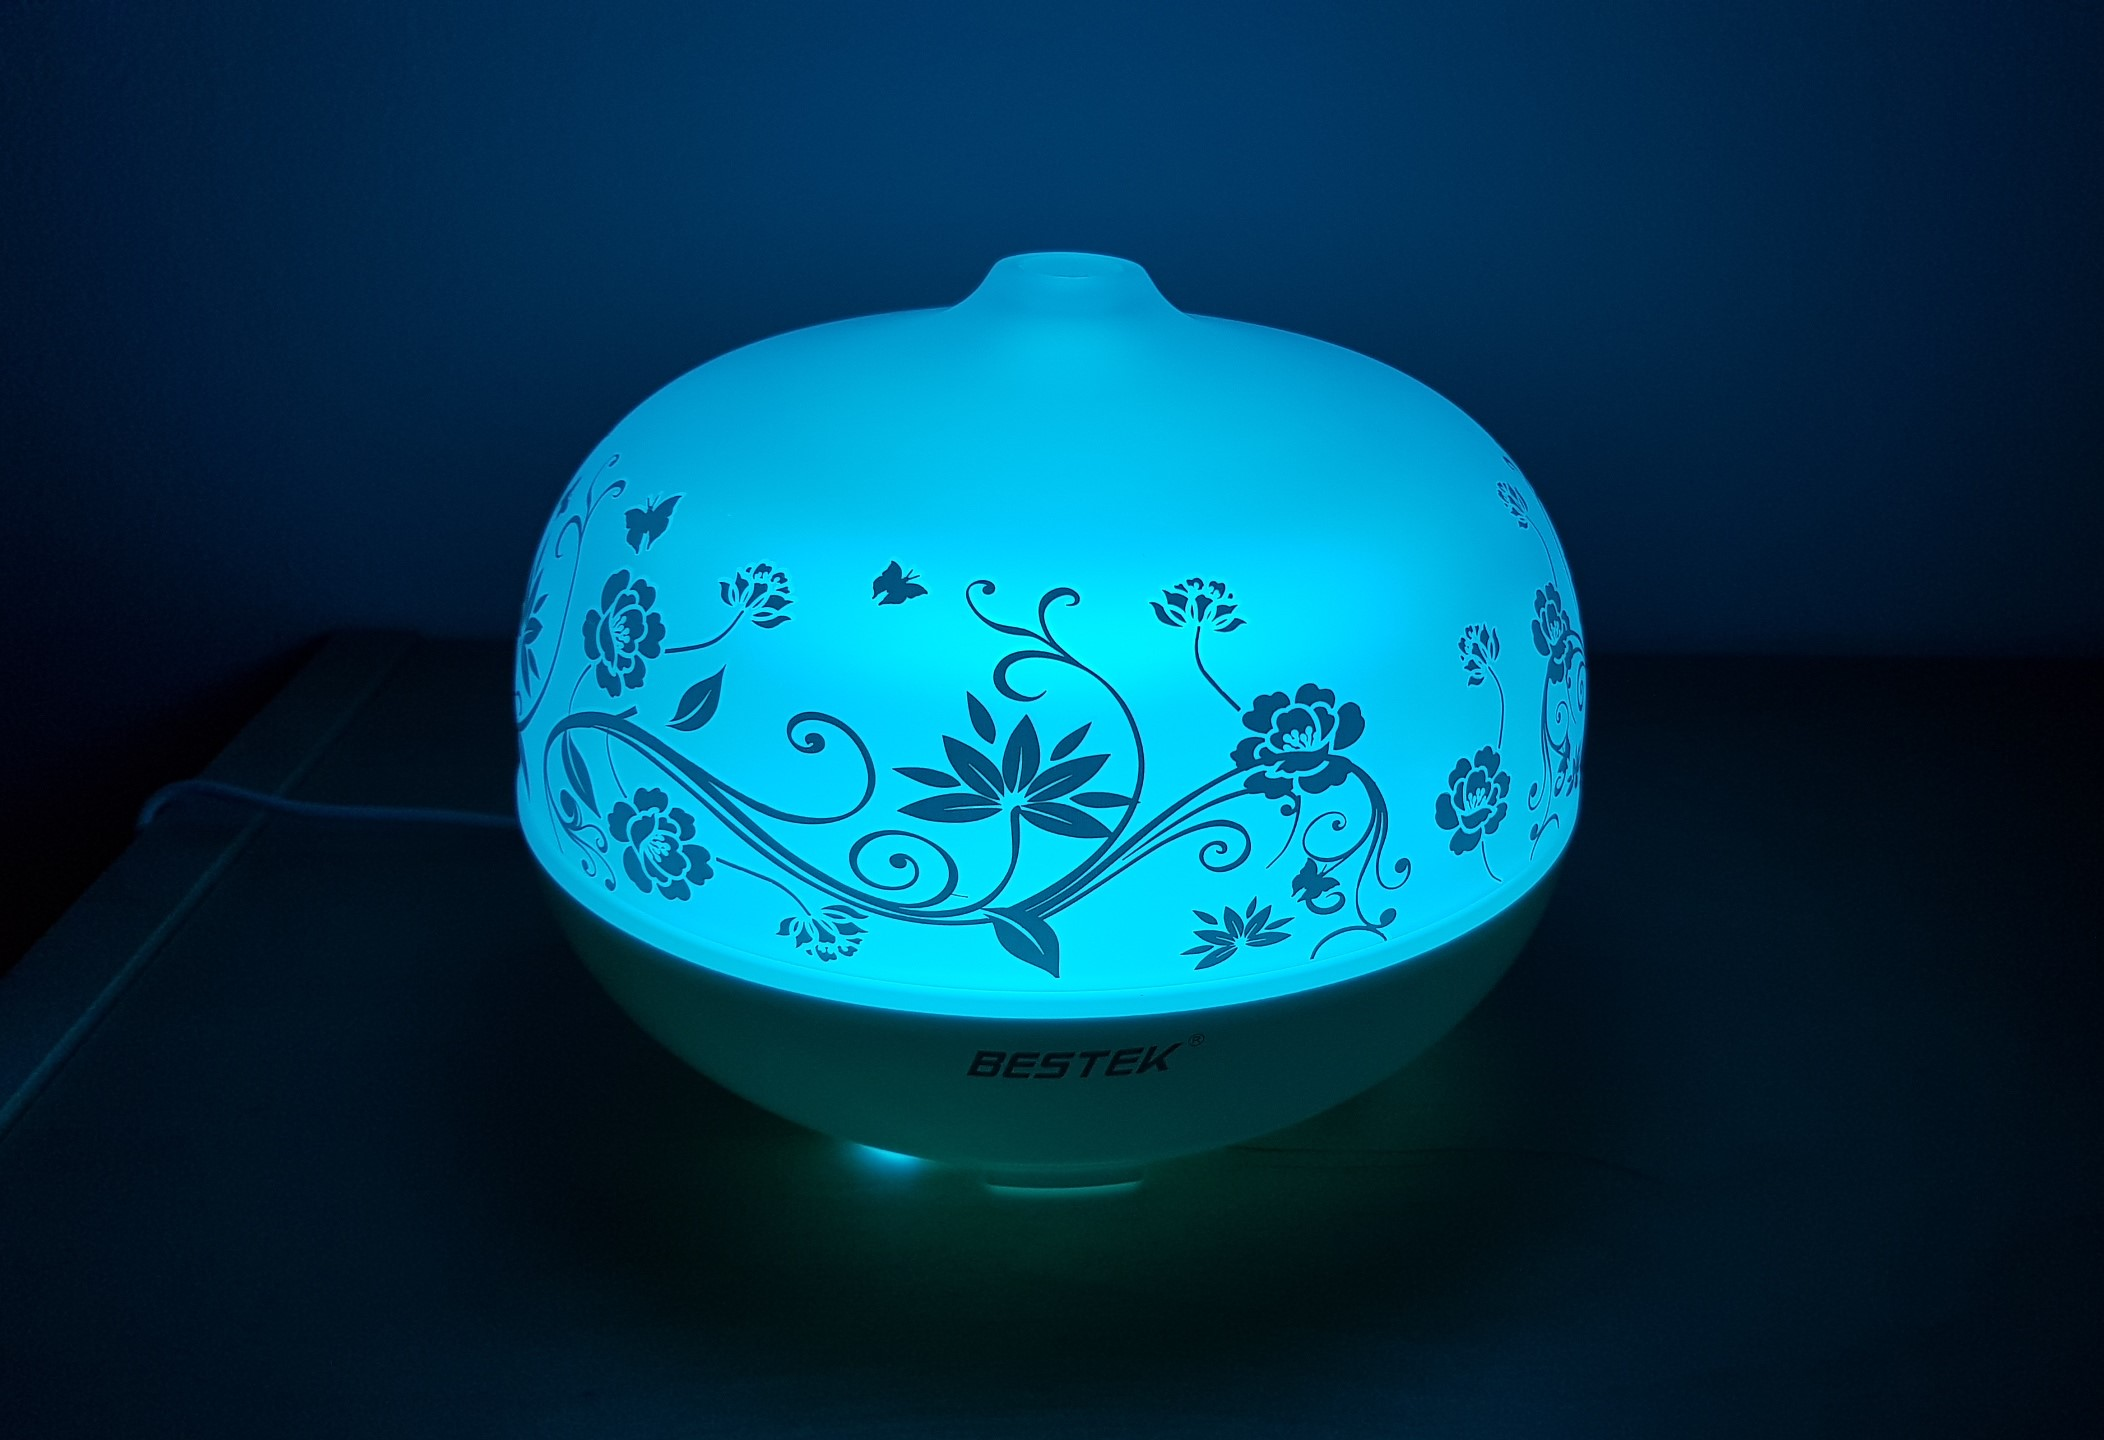 recensione diffusore di aromi e oli essenziali in vetro bestek